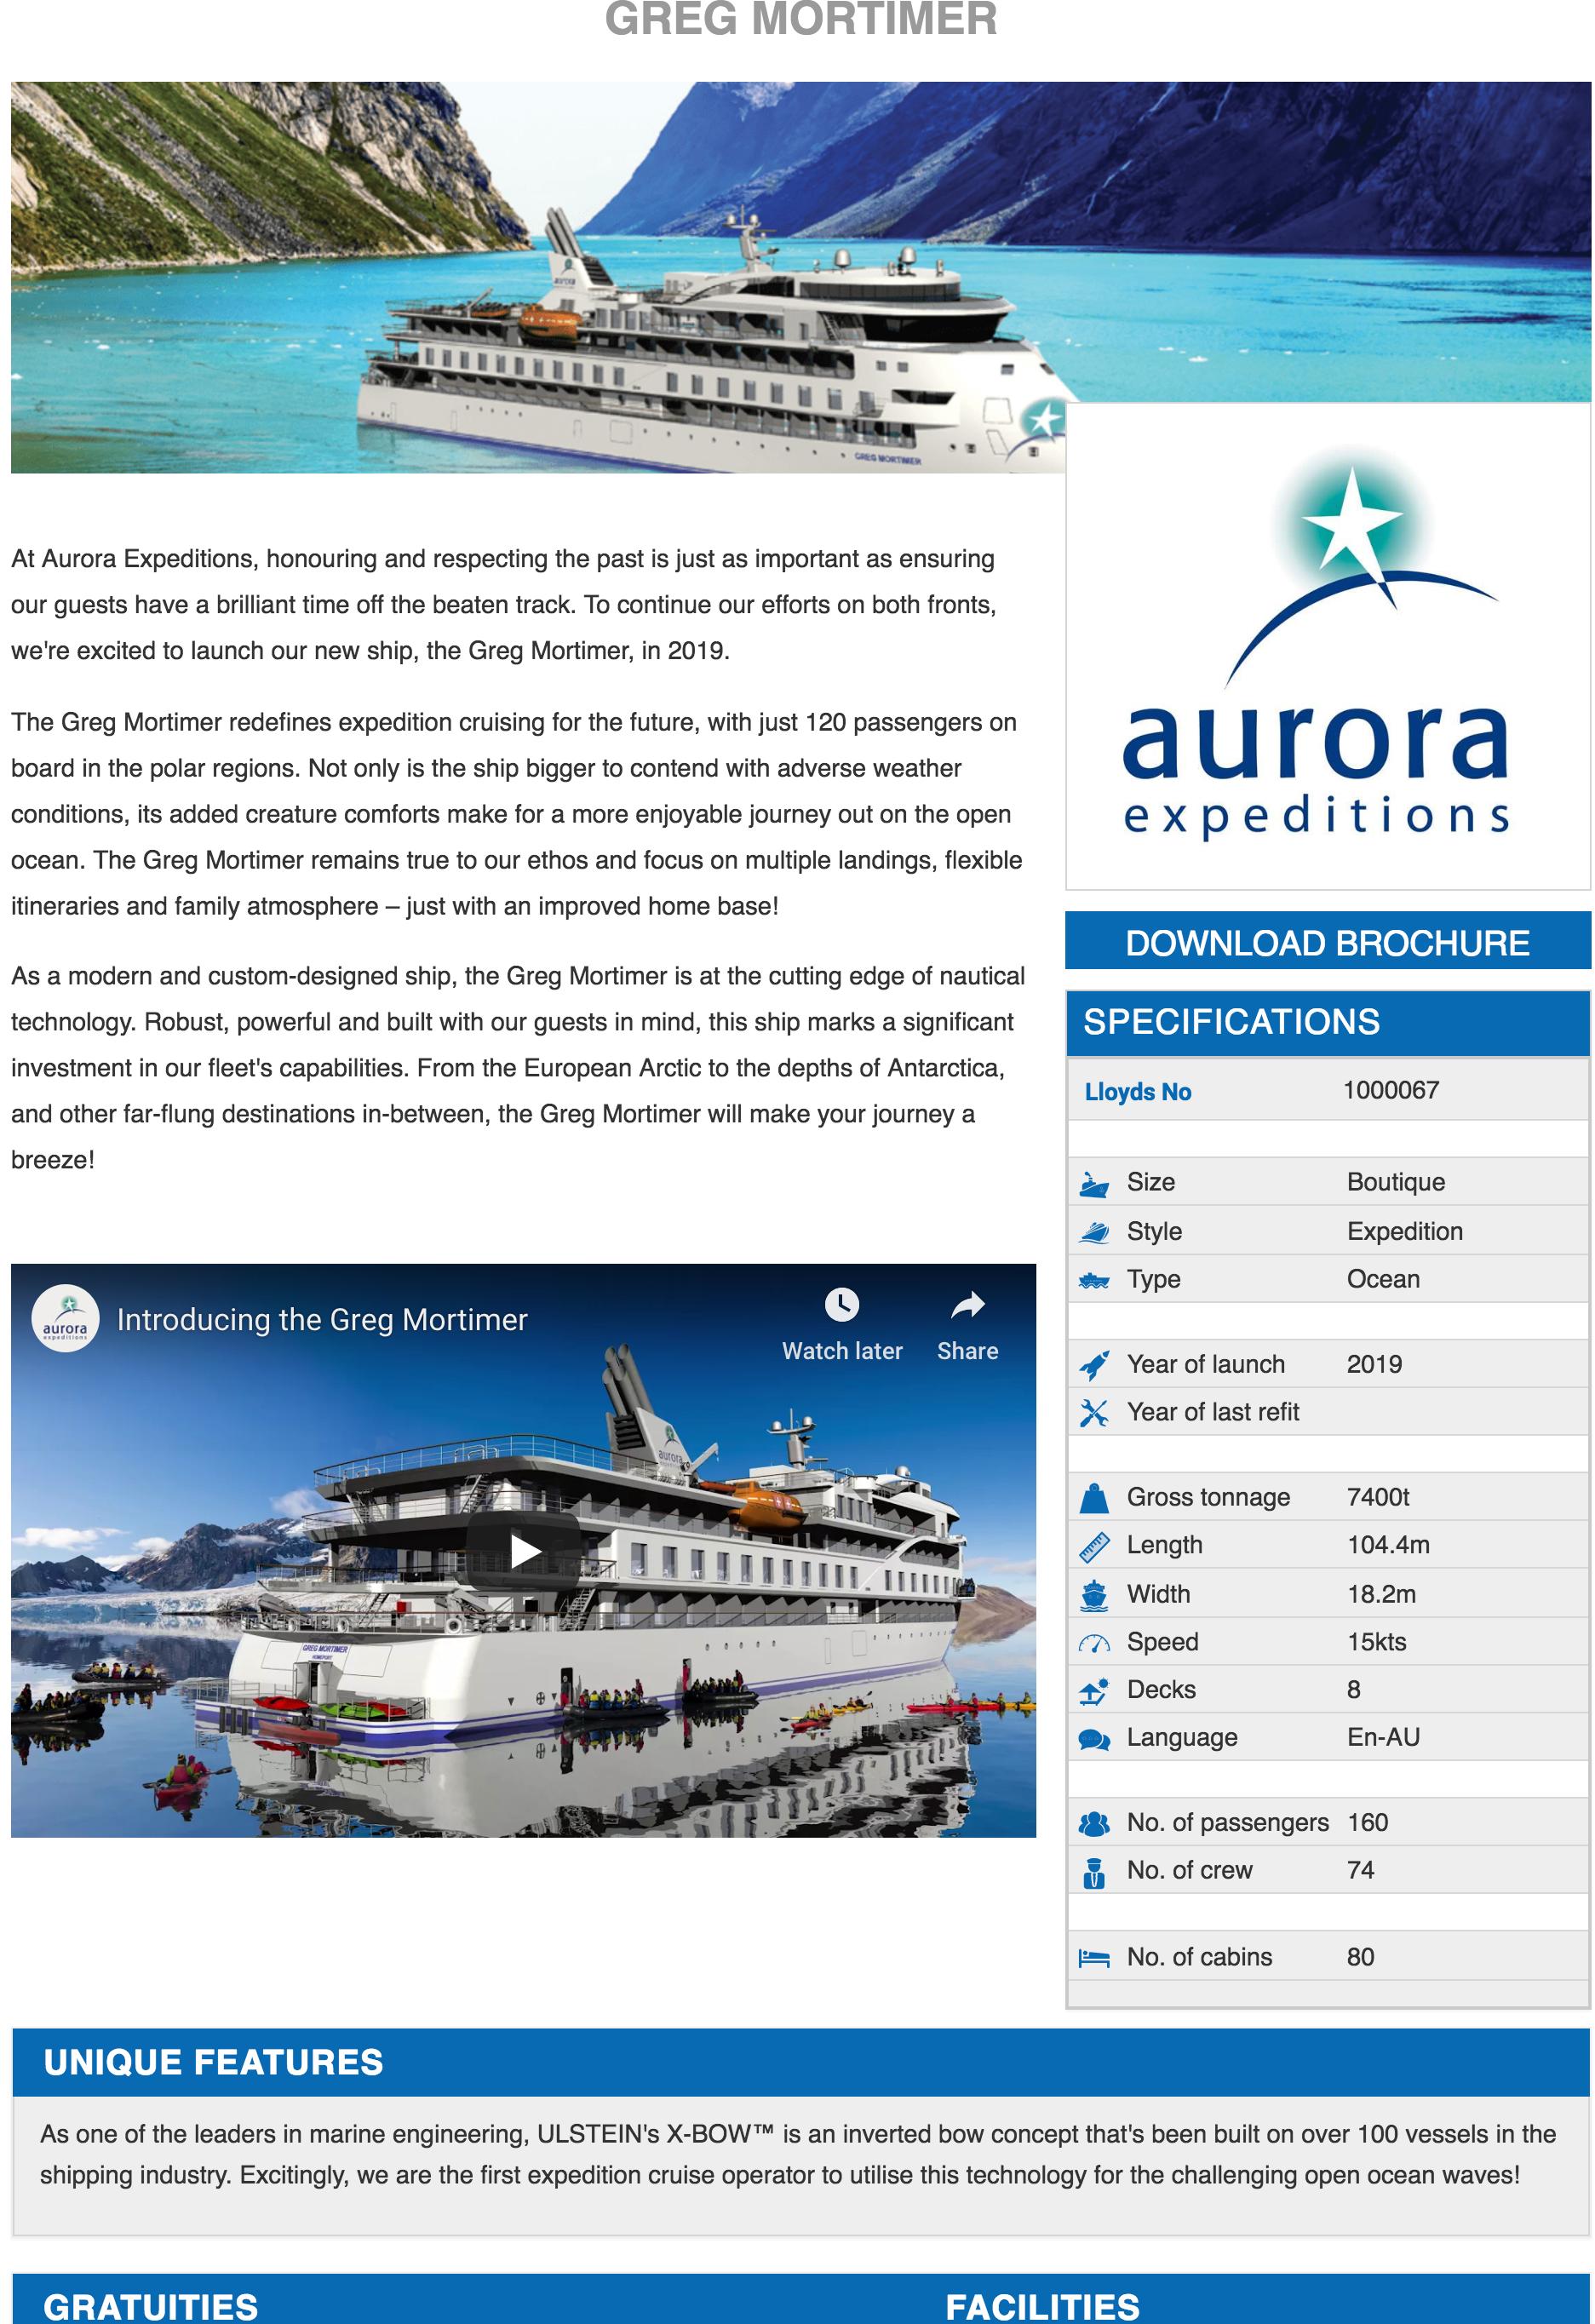 The Greg Mortimer Ship iFrame